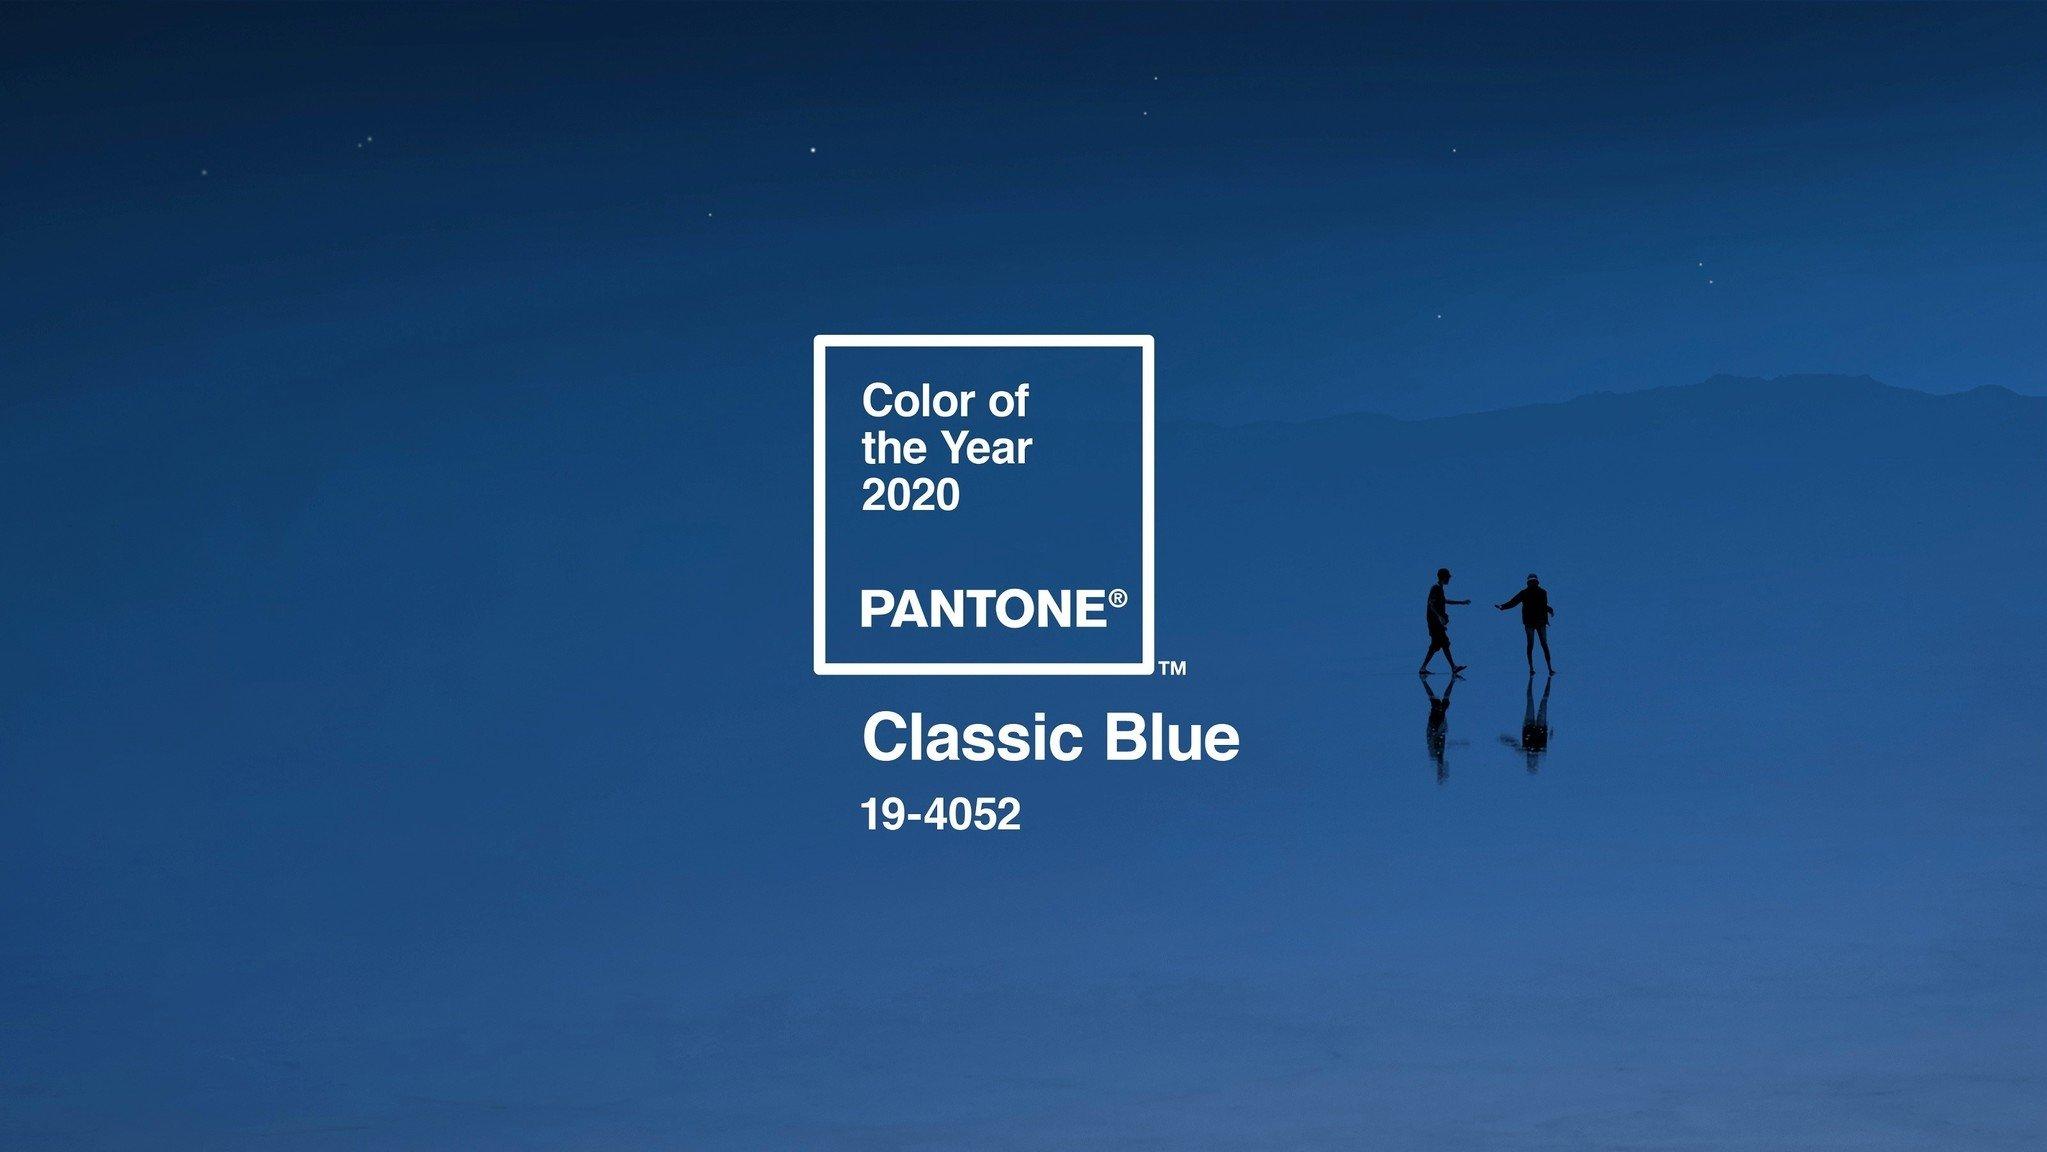 PANTONE 2020'NİN RENGİNİ AÇIKLADI: KLASİK MAVİ